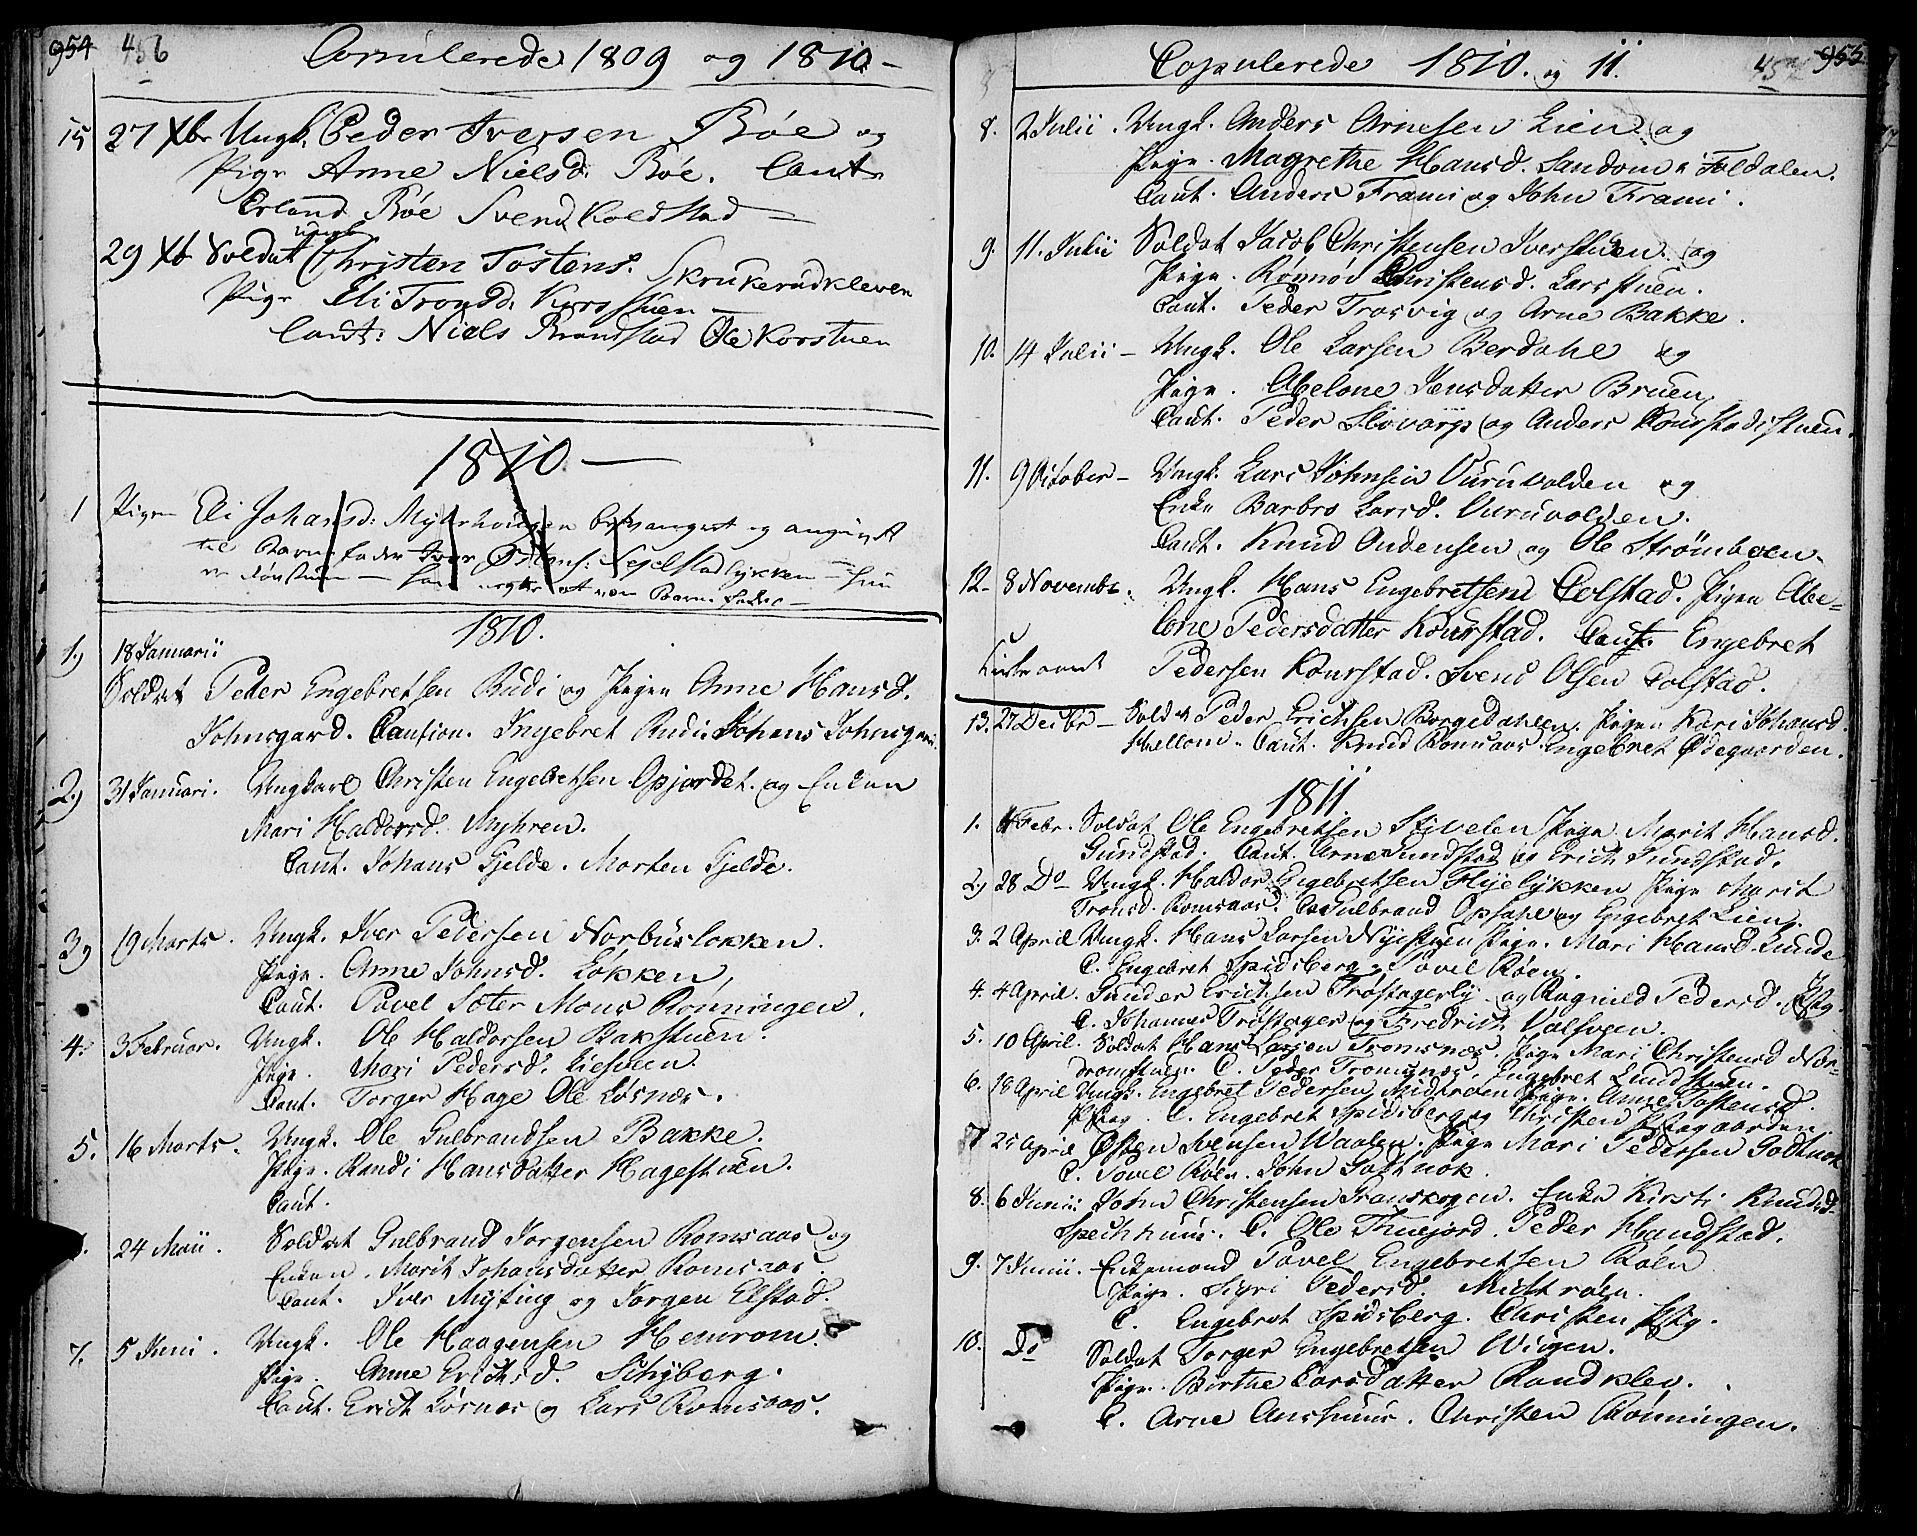 SAH, Ringebu prestekontor, Ministerialbok nr. 3, 1781-1820, s. 456-457